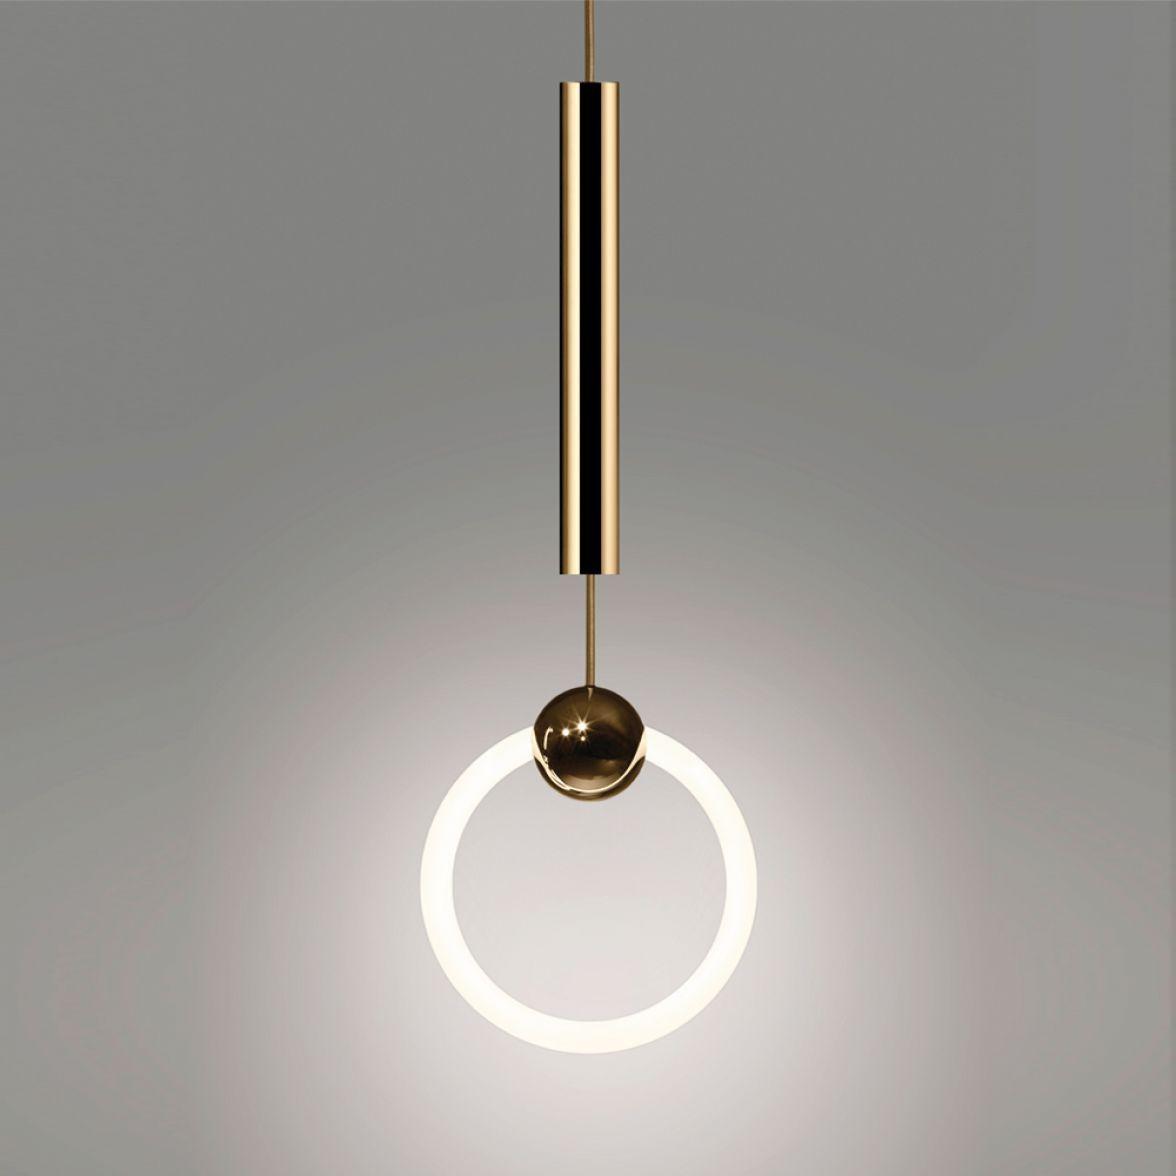 Ring light pendant фото цена